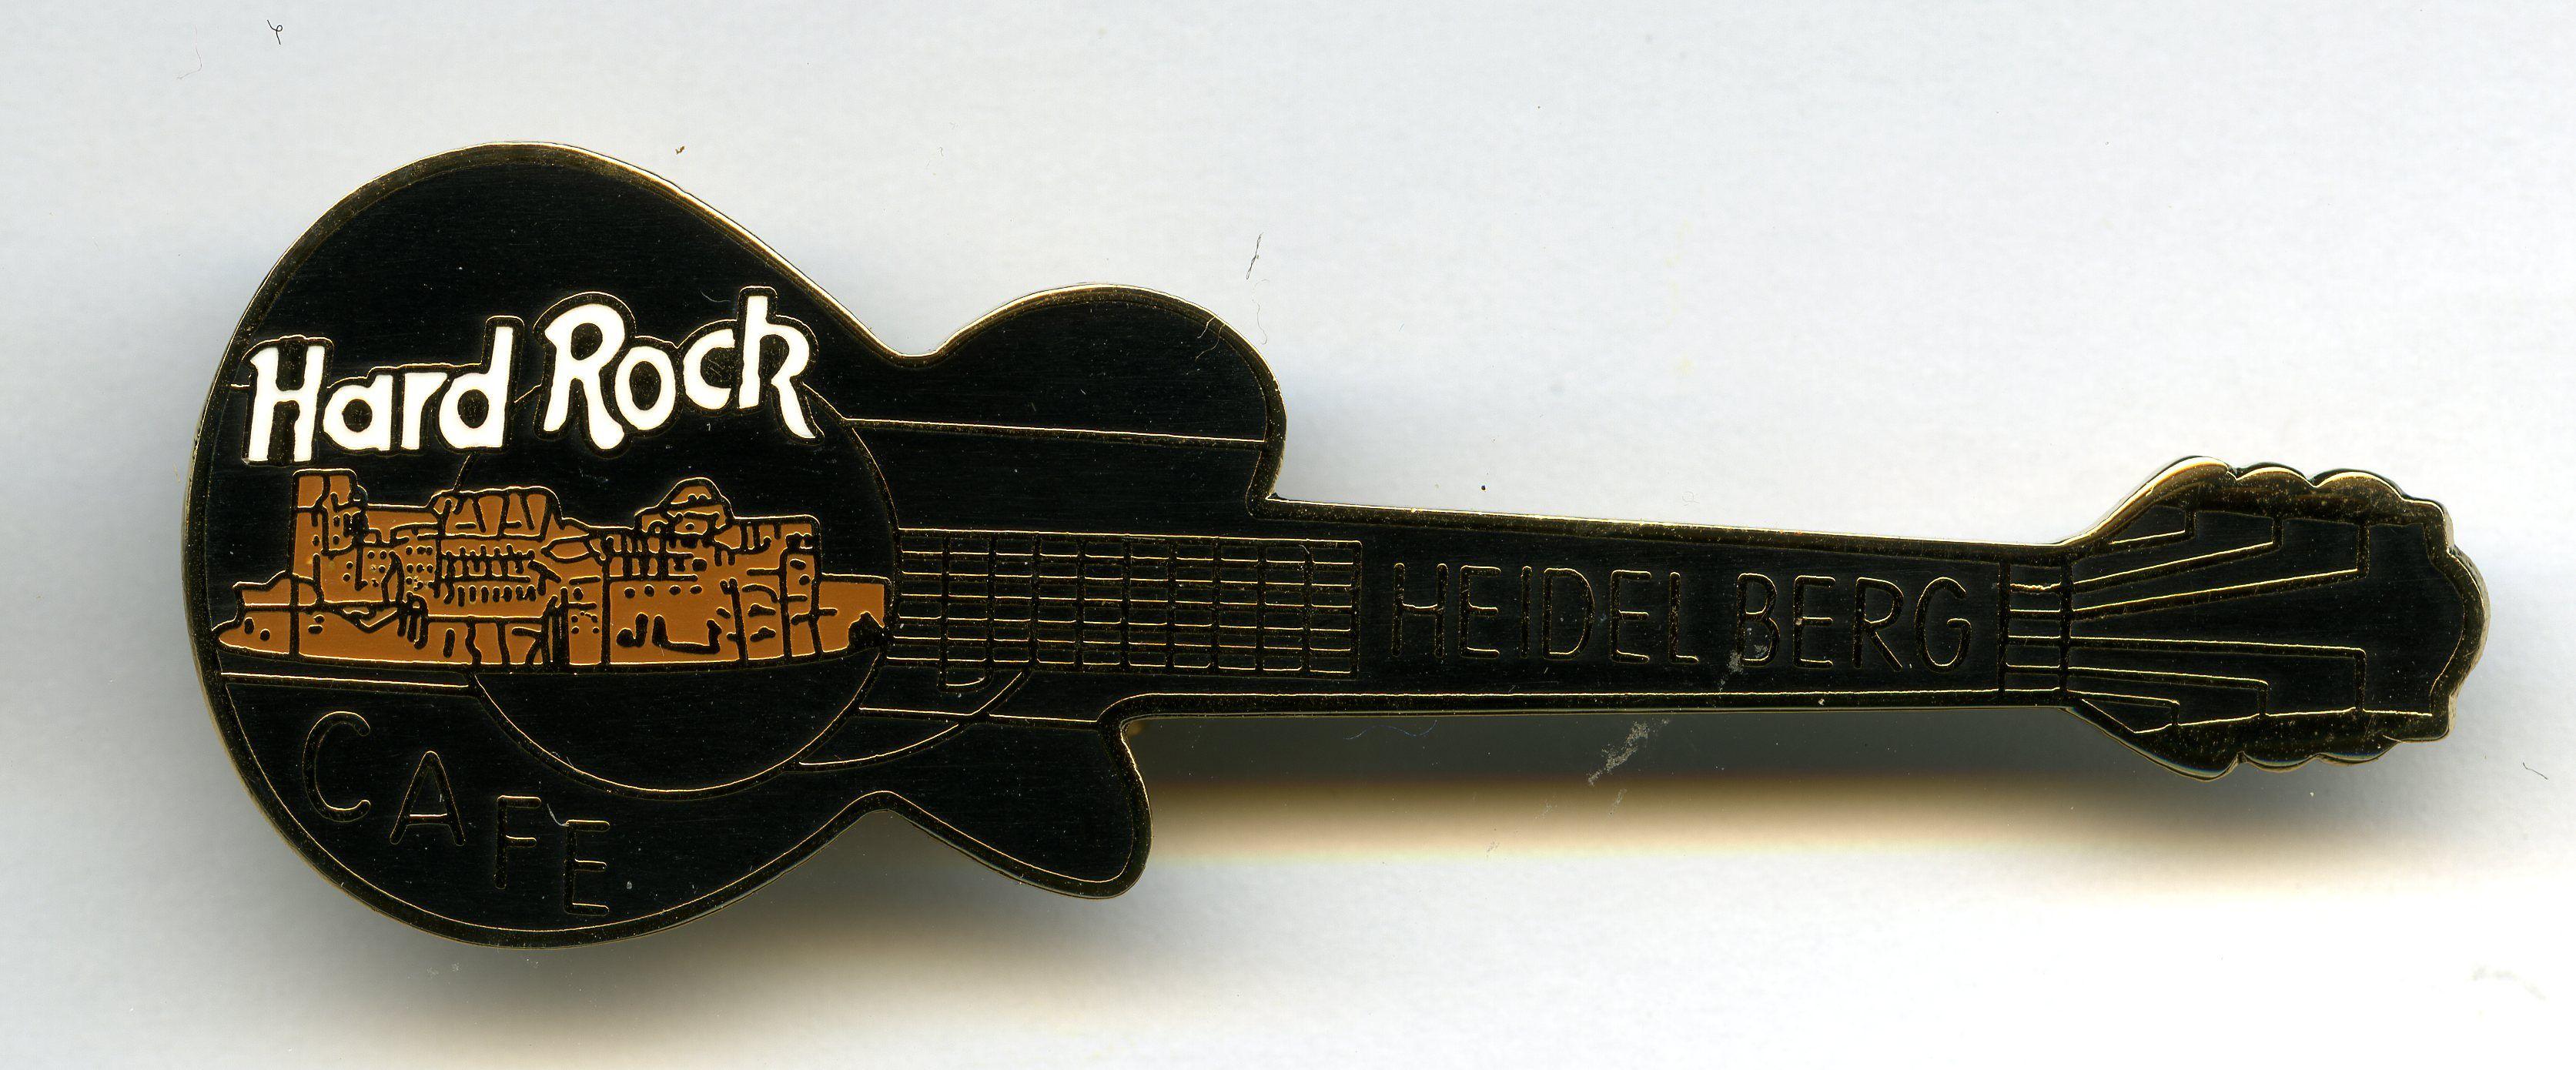 Heidelberg - Hard Rock Cafe Guitar Pin | Hard rock cafe